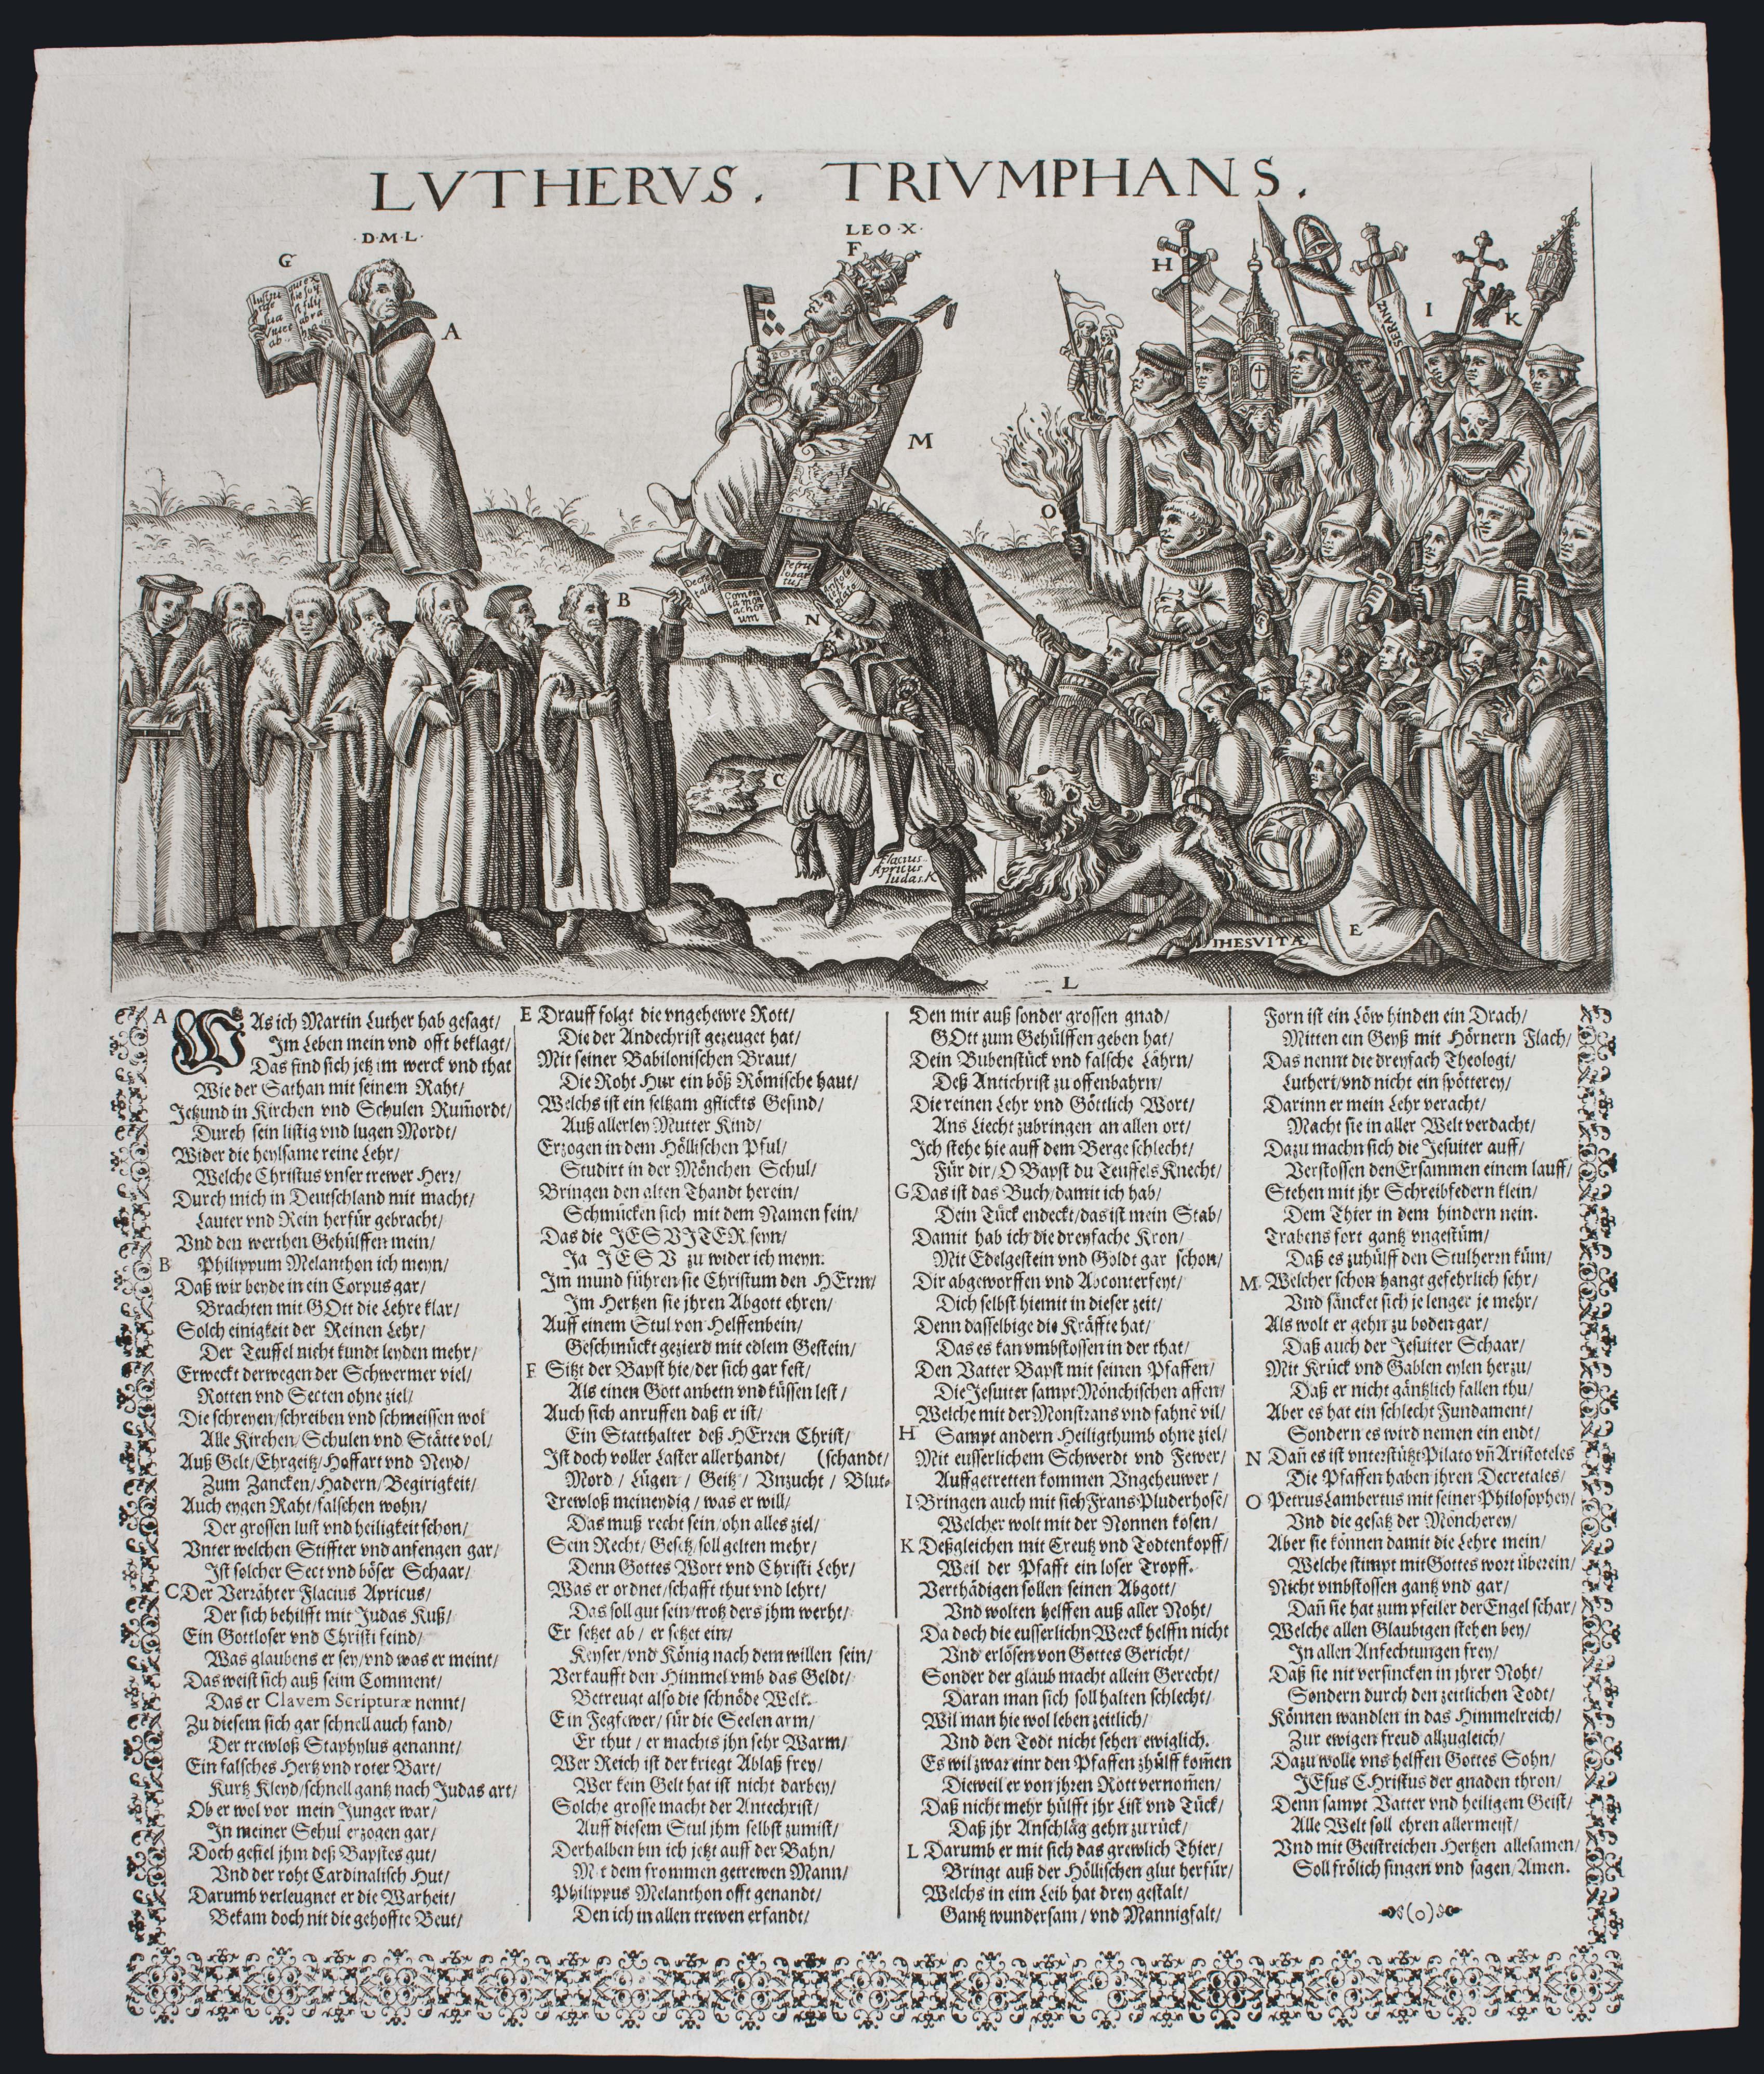 Lutherus Triumphans